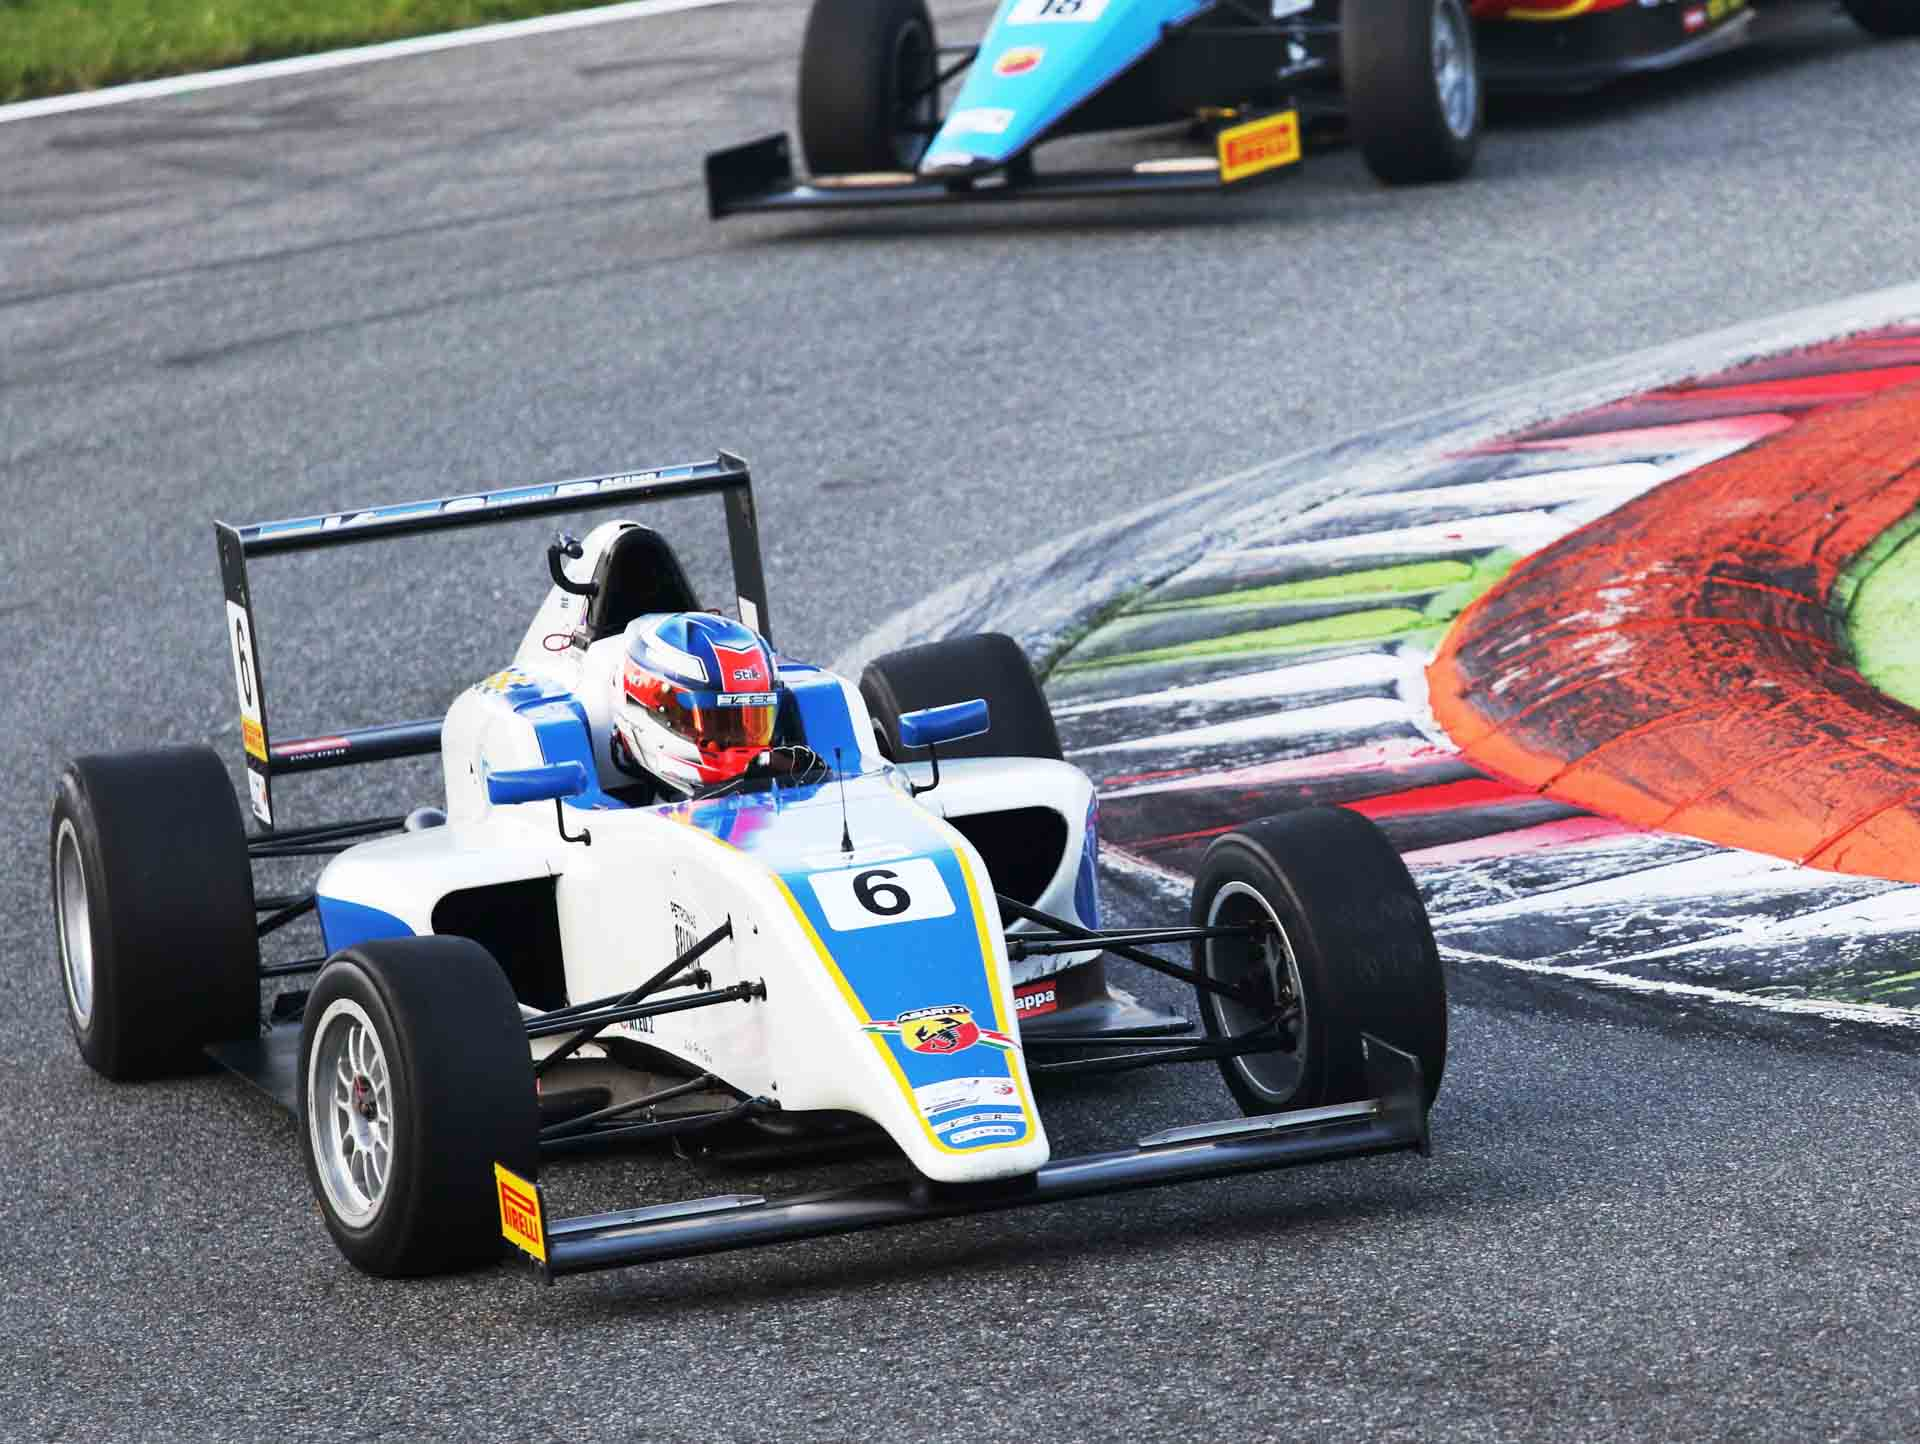 2016 Monza - VSR Jaden (5)a